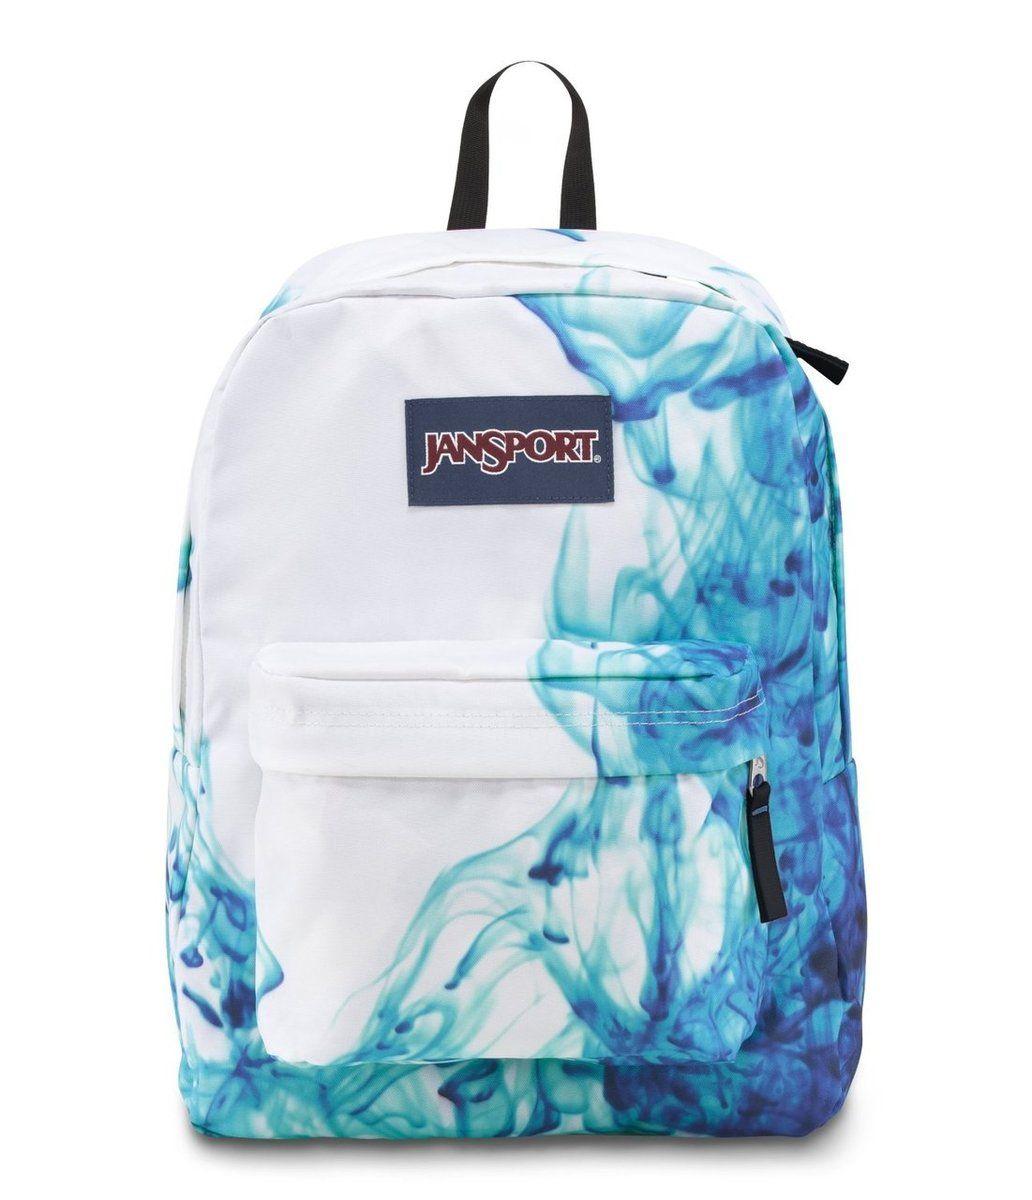 JANSPORT SUPERBREAK BACKPACK SCHOOL BAG - Multi/Blue Drip Dye, $29.99 (http://www.znvora.com/jansport-superbreak-backpack-school-bag-multi-blue-drip-dye/)